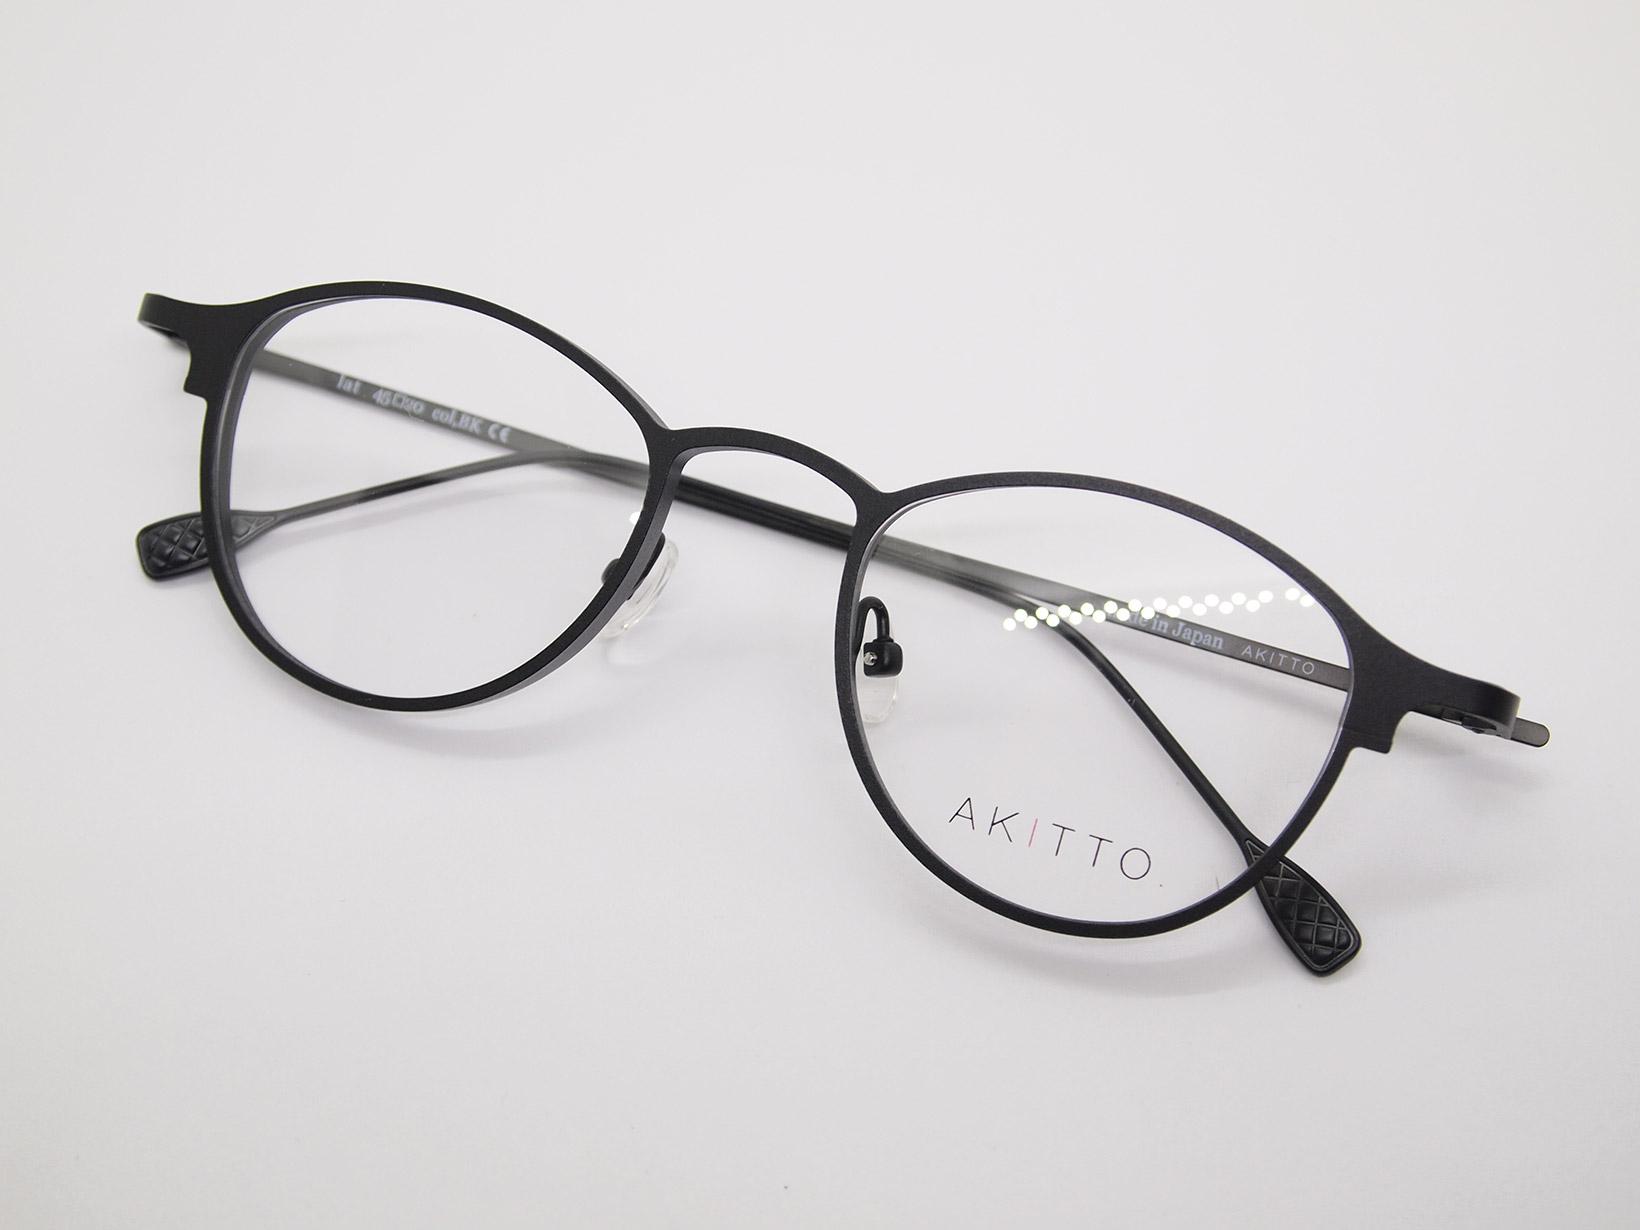 AKITTO 2021-4th lat color|BK size:45□20 material:titanium price:¥46,200-(税込み)